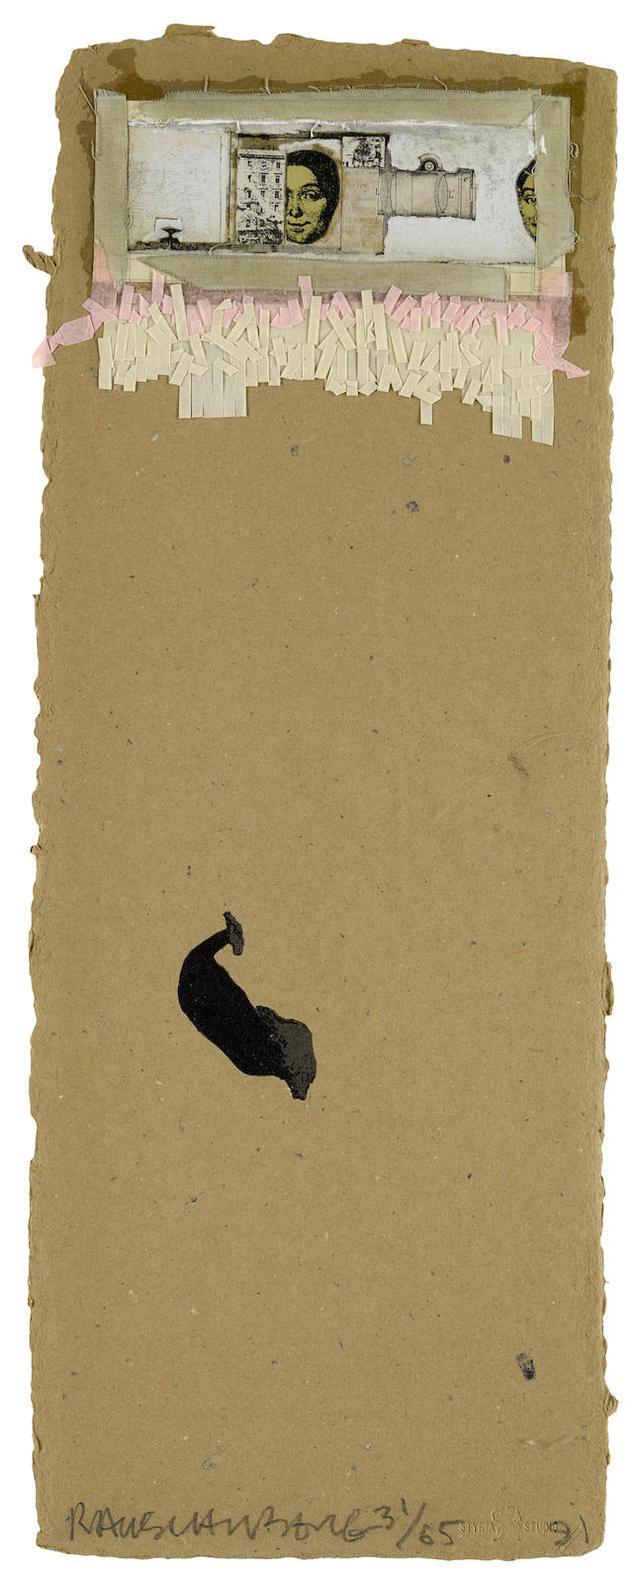 Robert Rauschenberg-Shirtboard, From Shirtboards, Morocco, Italy 52 Portfolio-1991